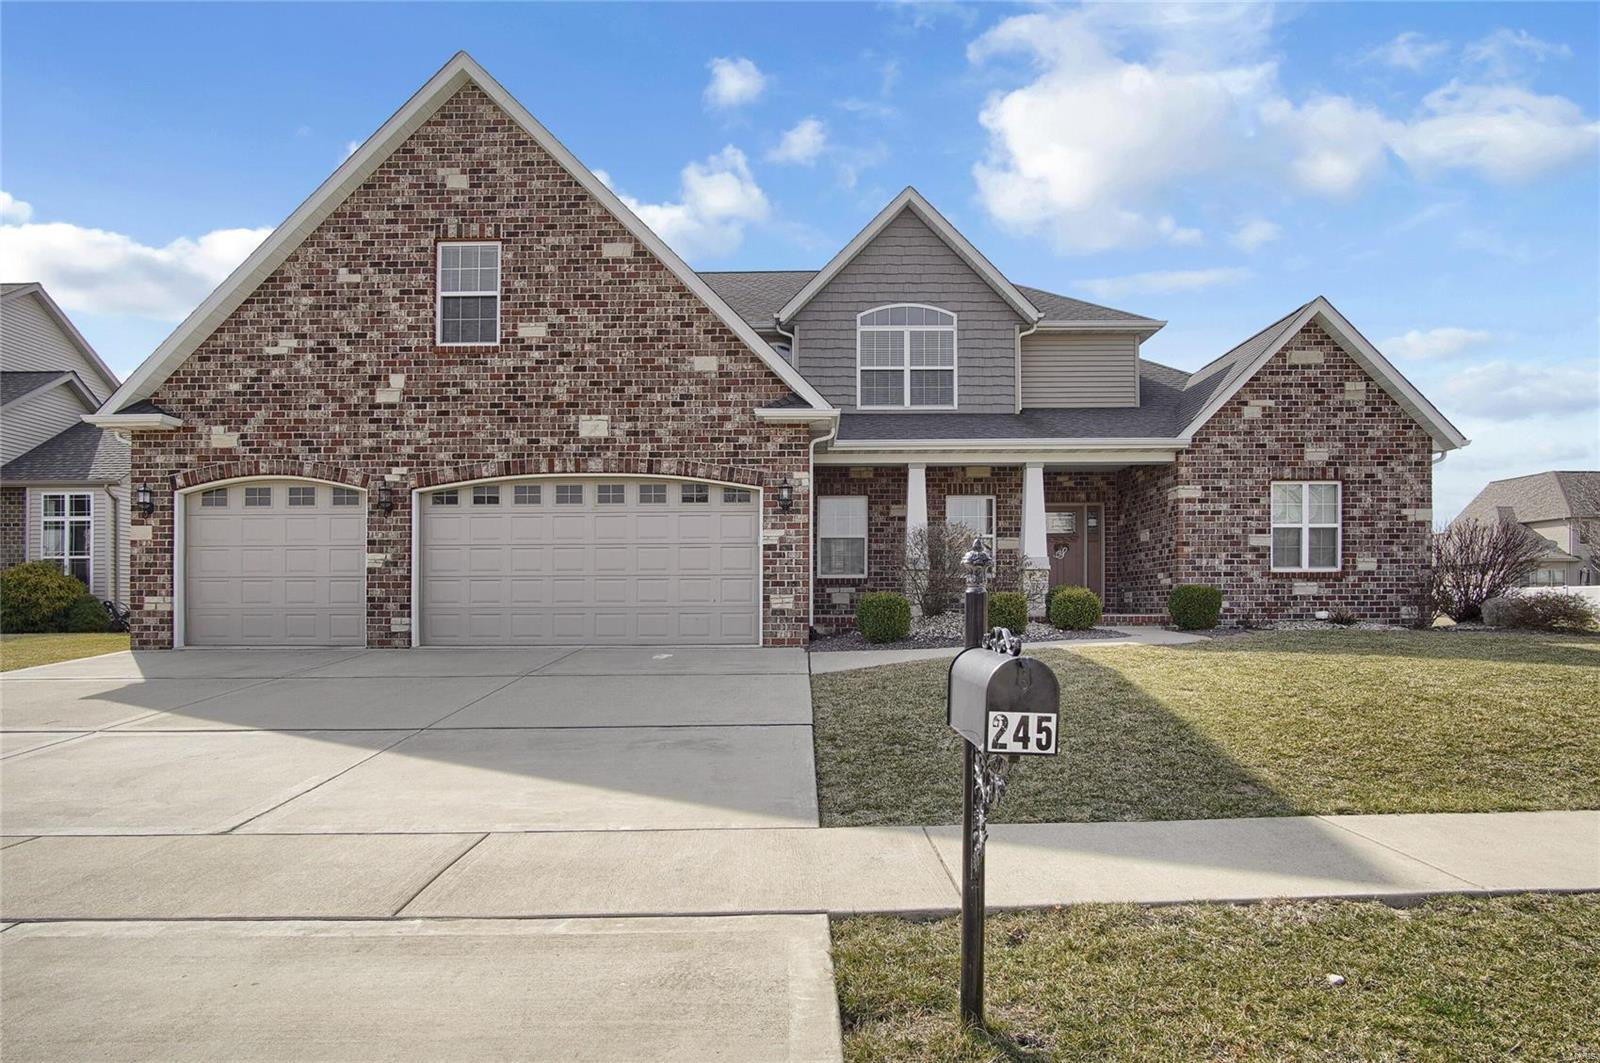 245 Oakshire Drive E Property Photo - Glen Carbon, IL real estate listing